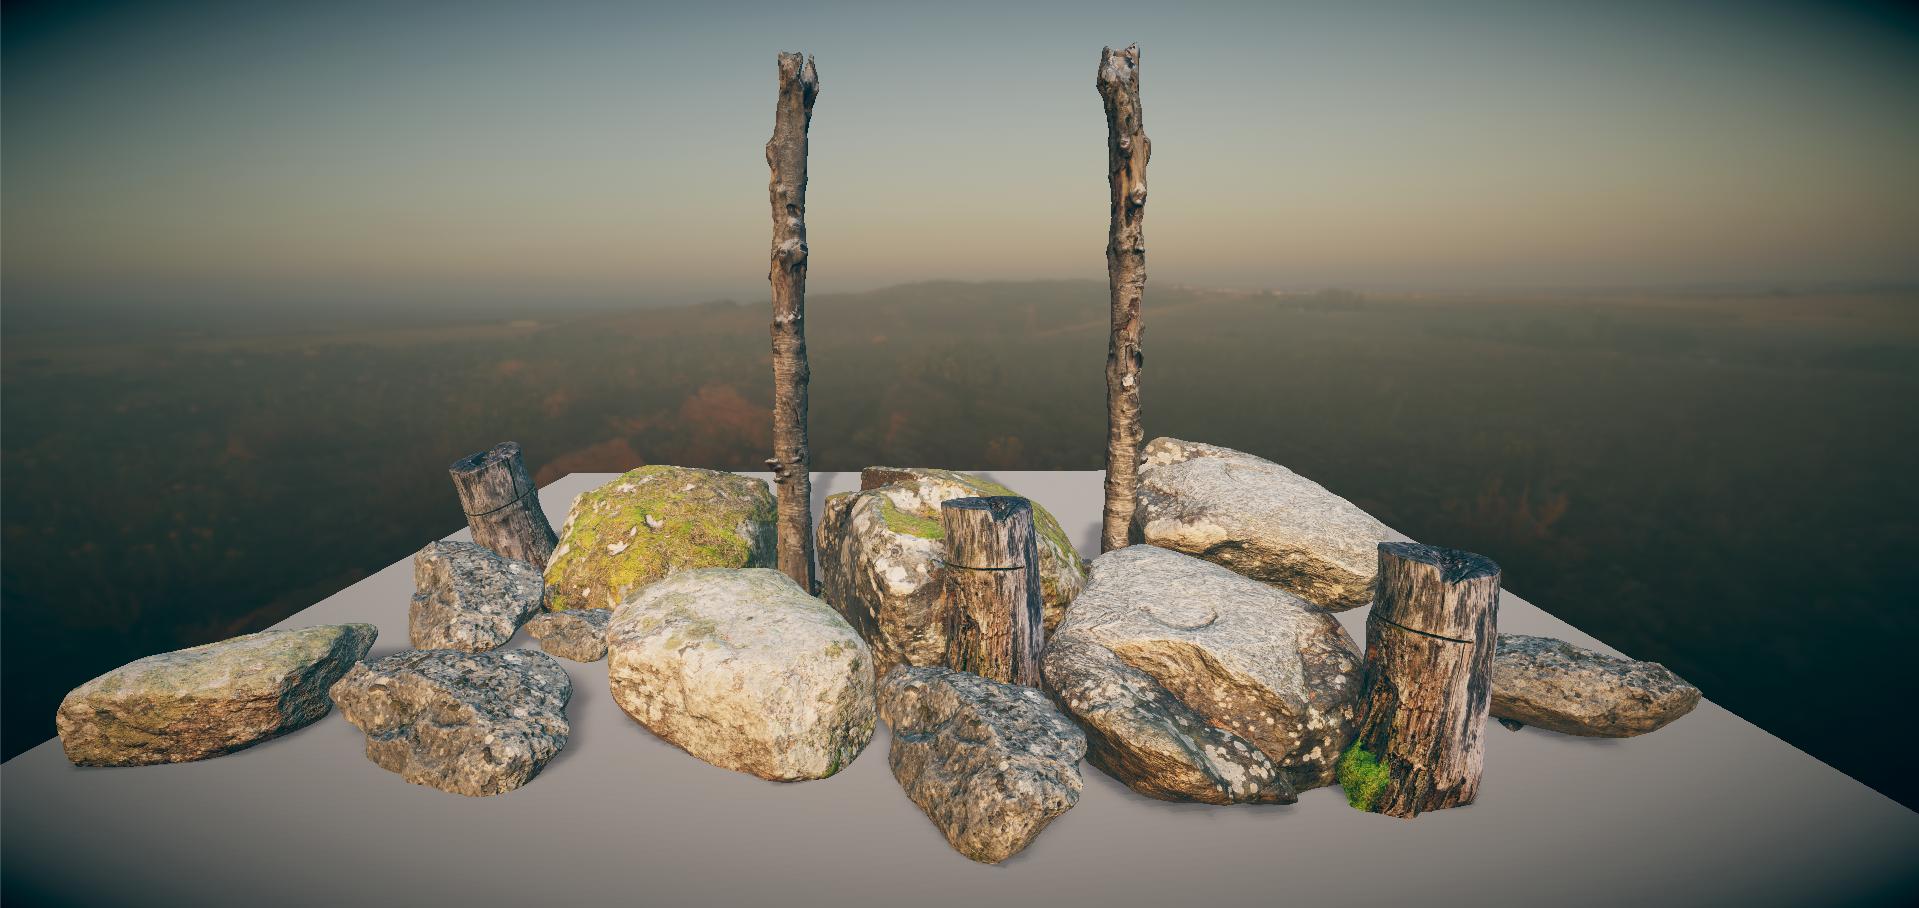 Photoscanned Rocks & Tree trunks